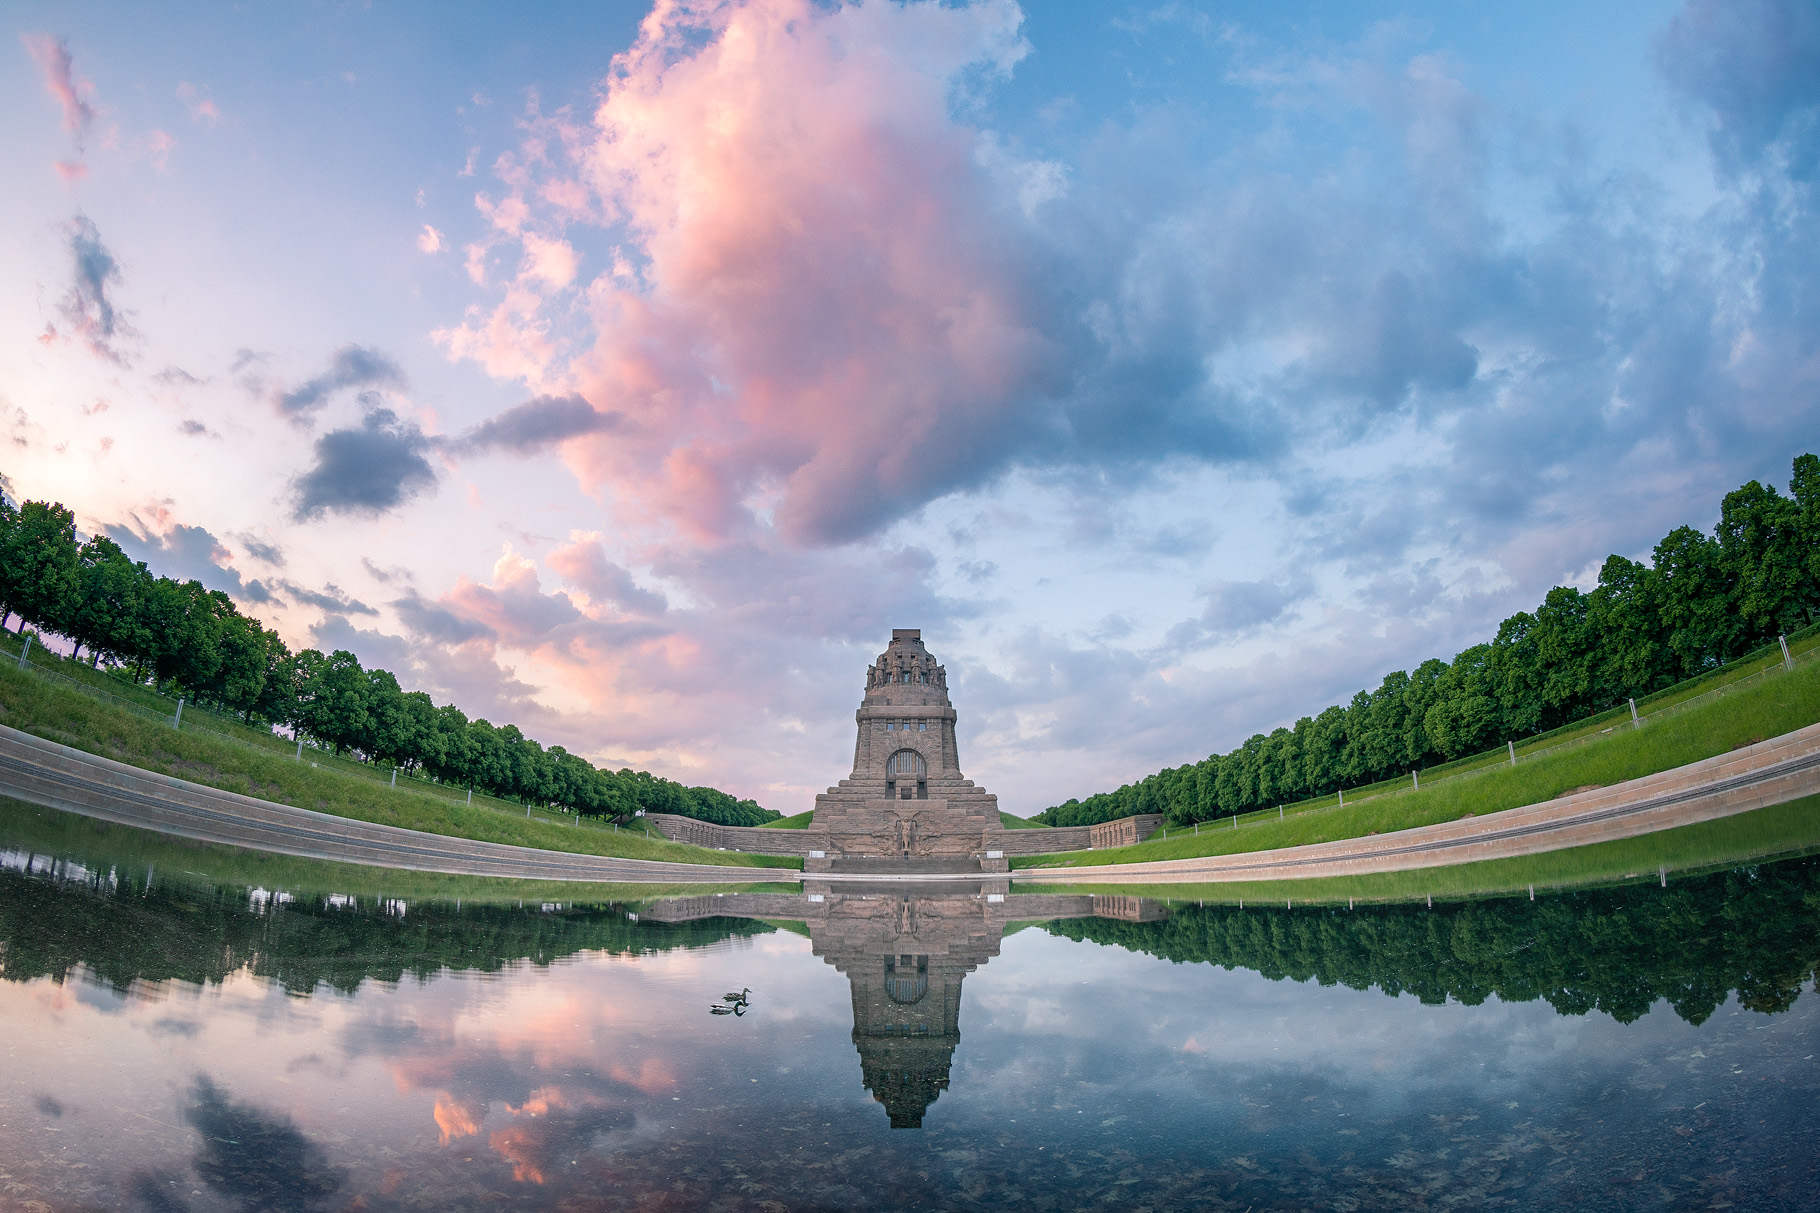 Völkerschlachtdenkmal, Germany